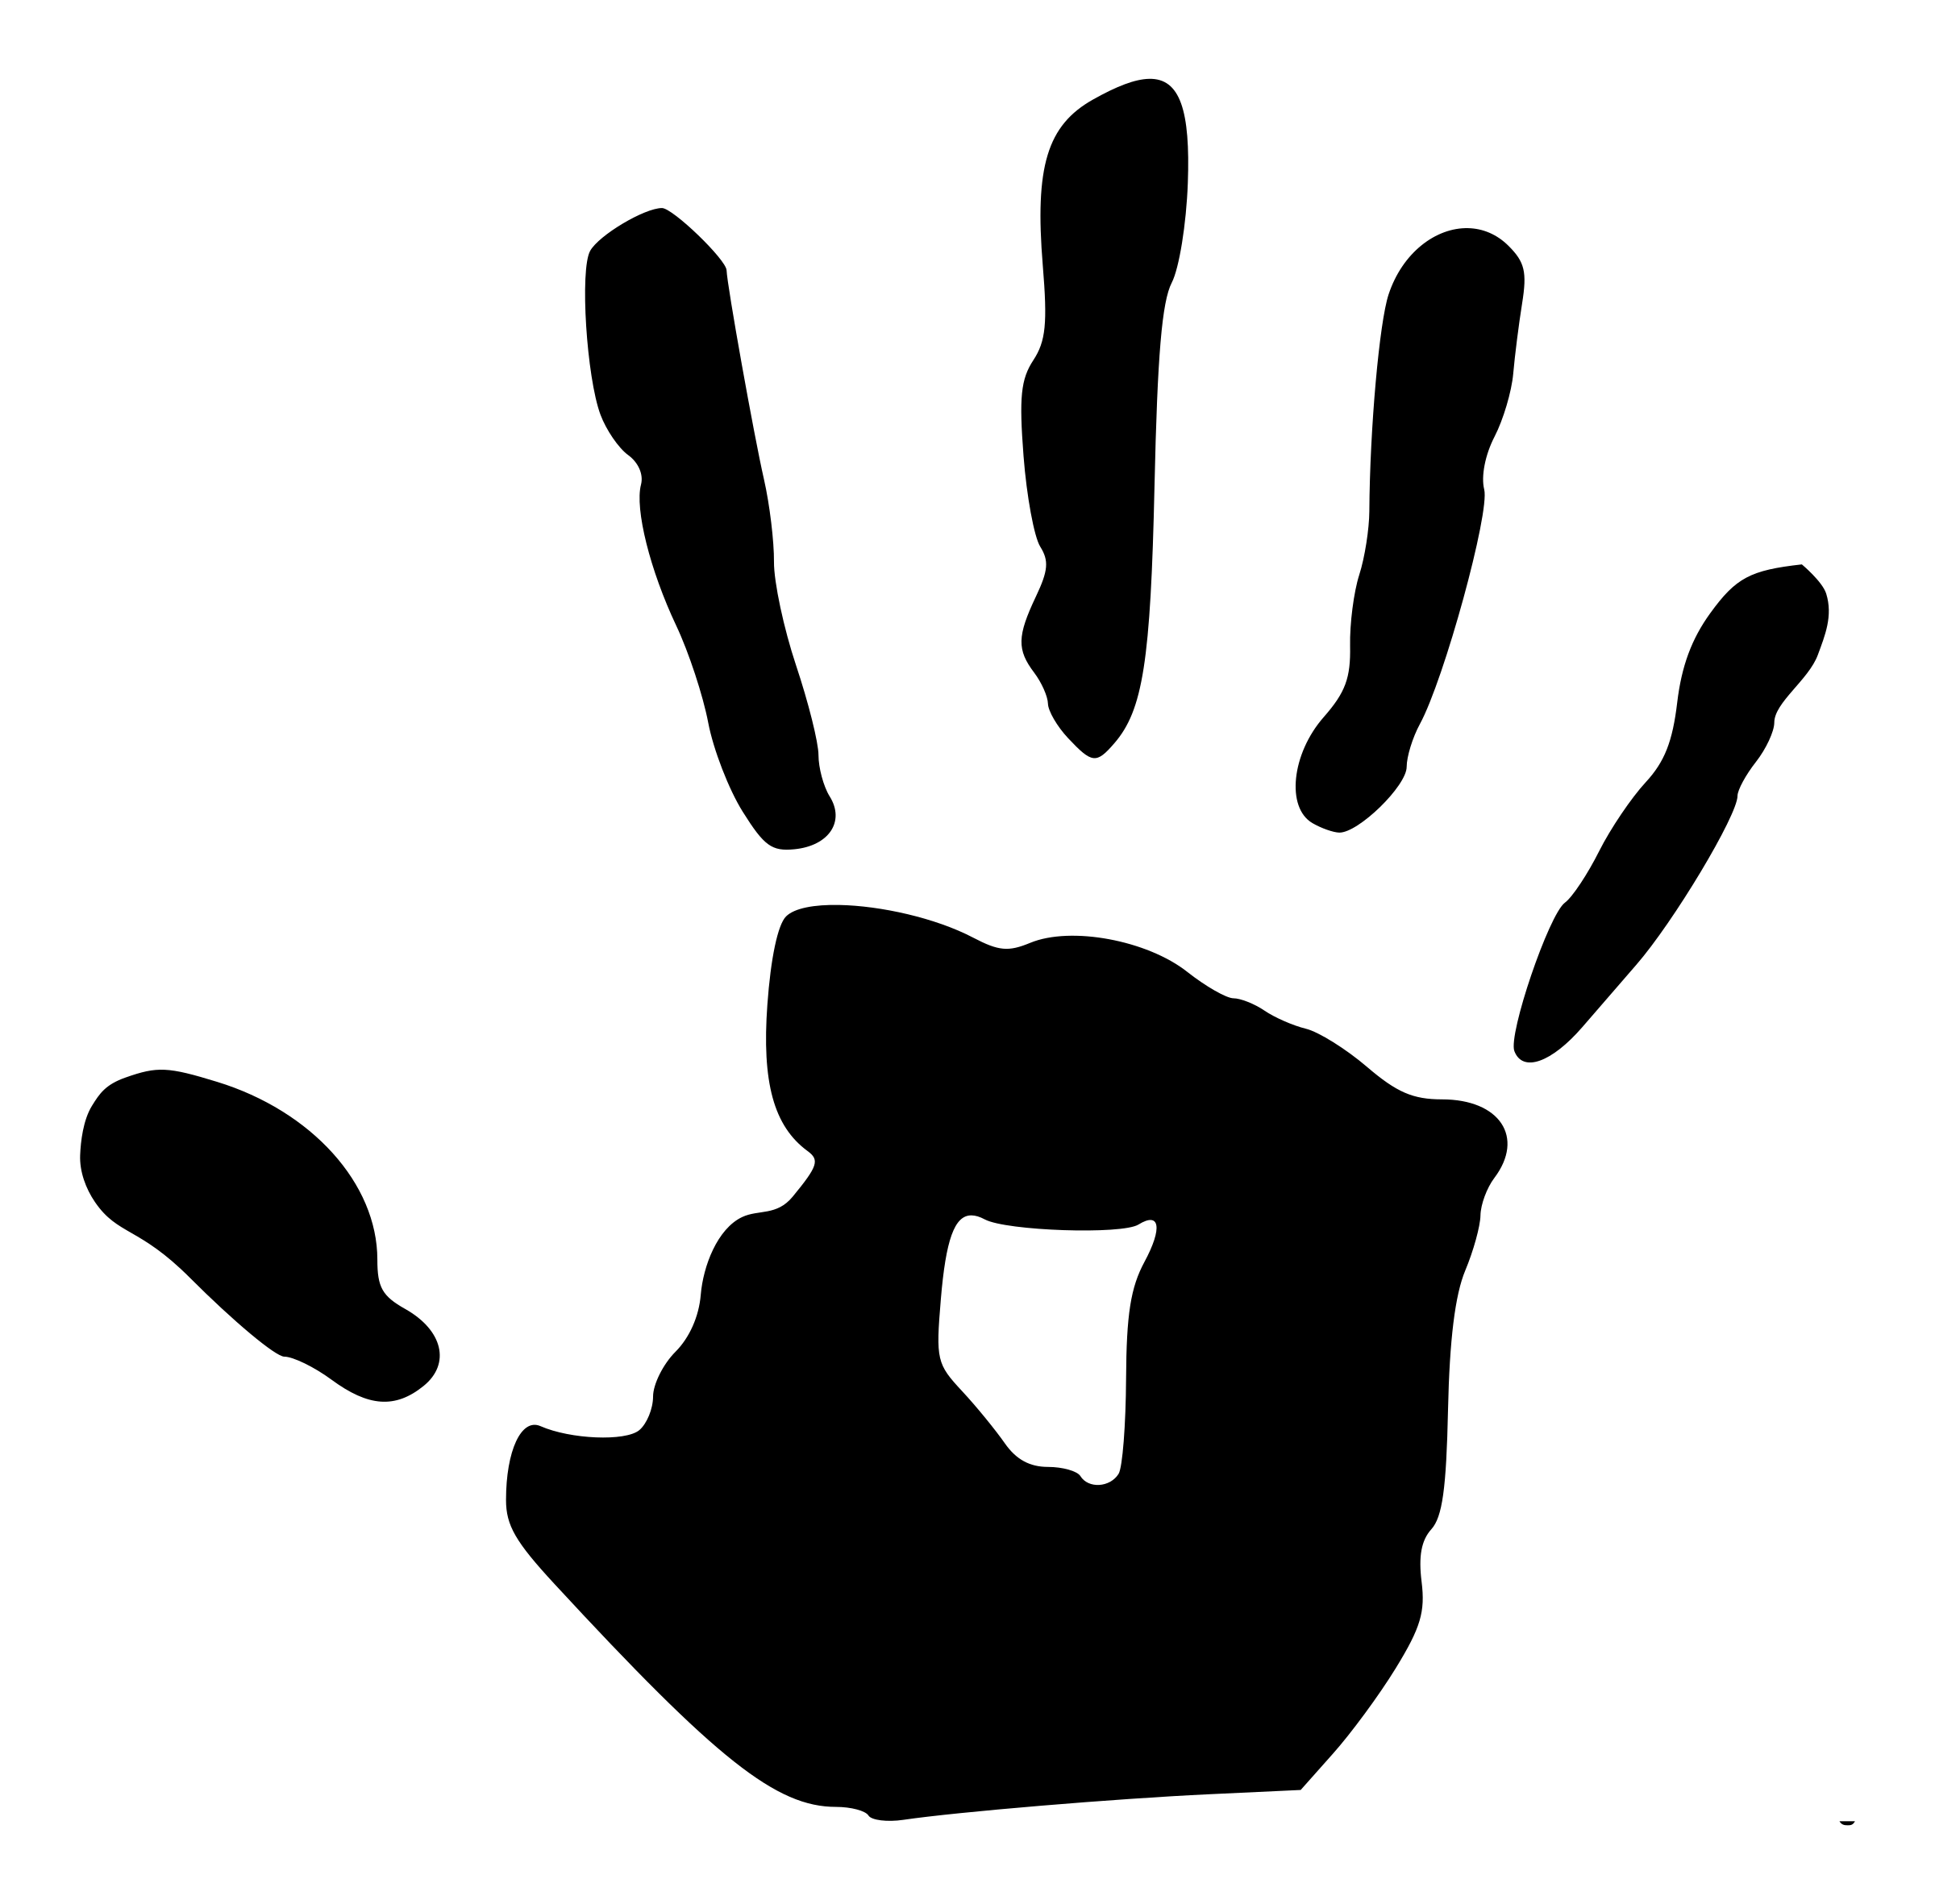 Hands clipart logo. Hand print big image